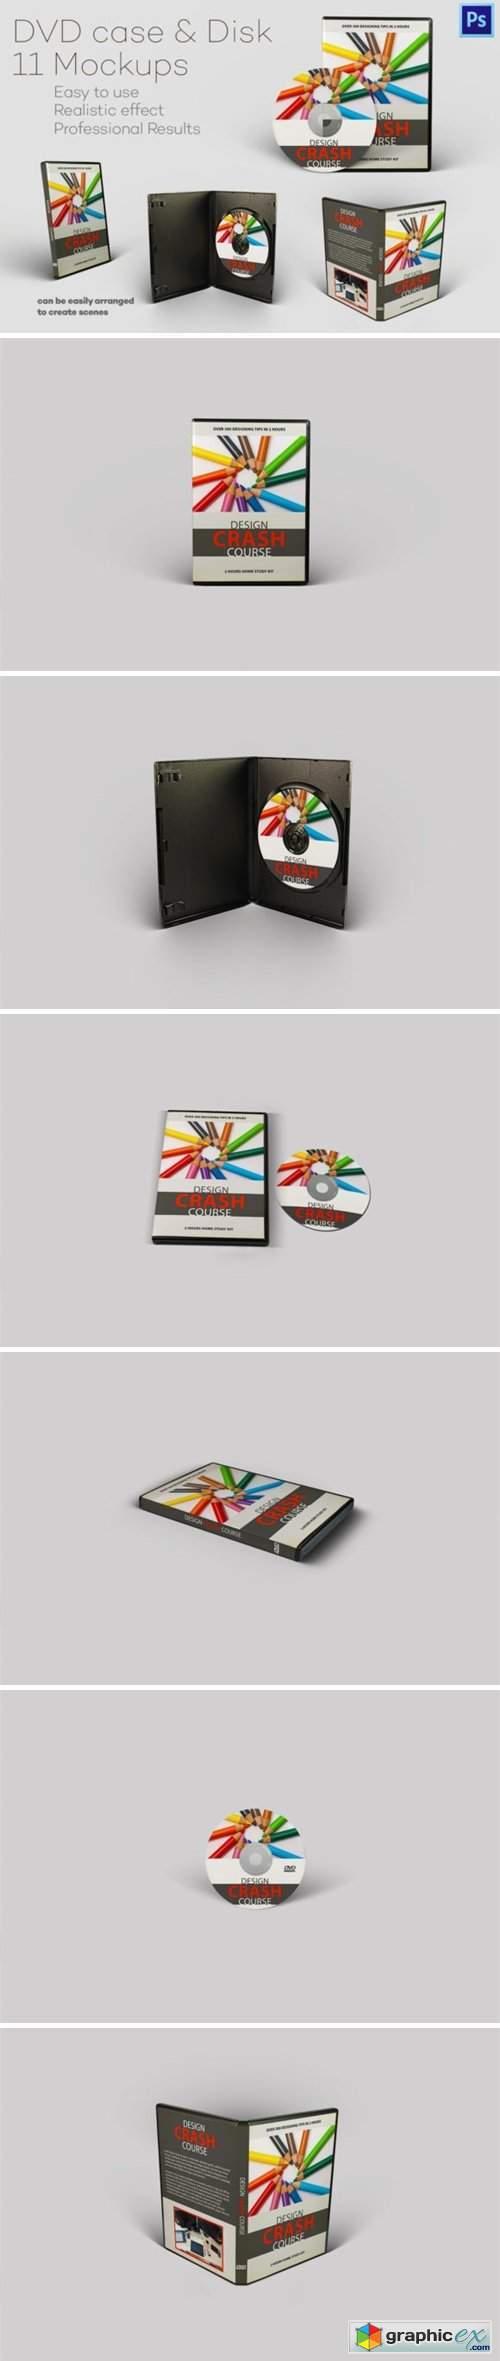 Photorealistc DVD Case & Disk Mockups